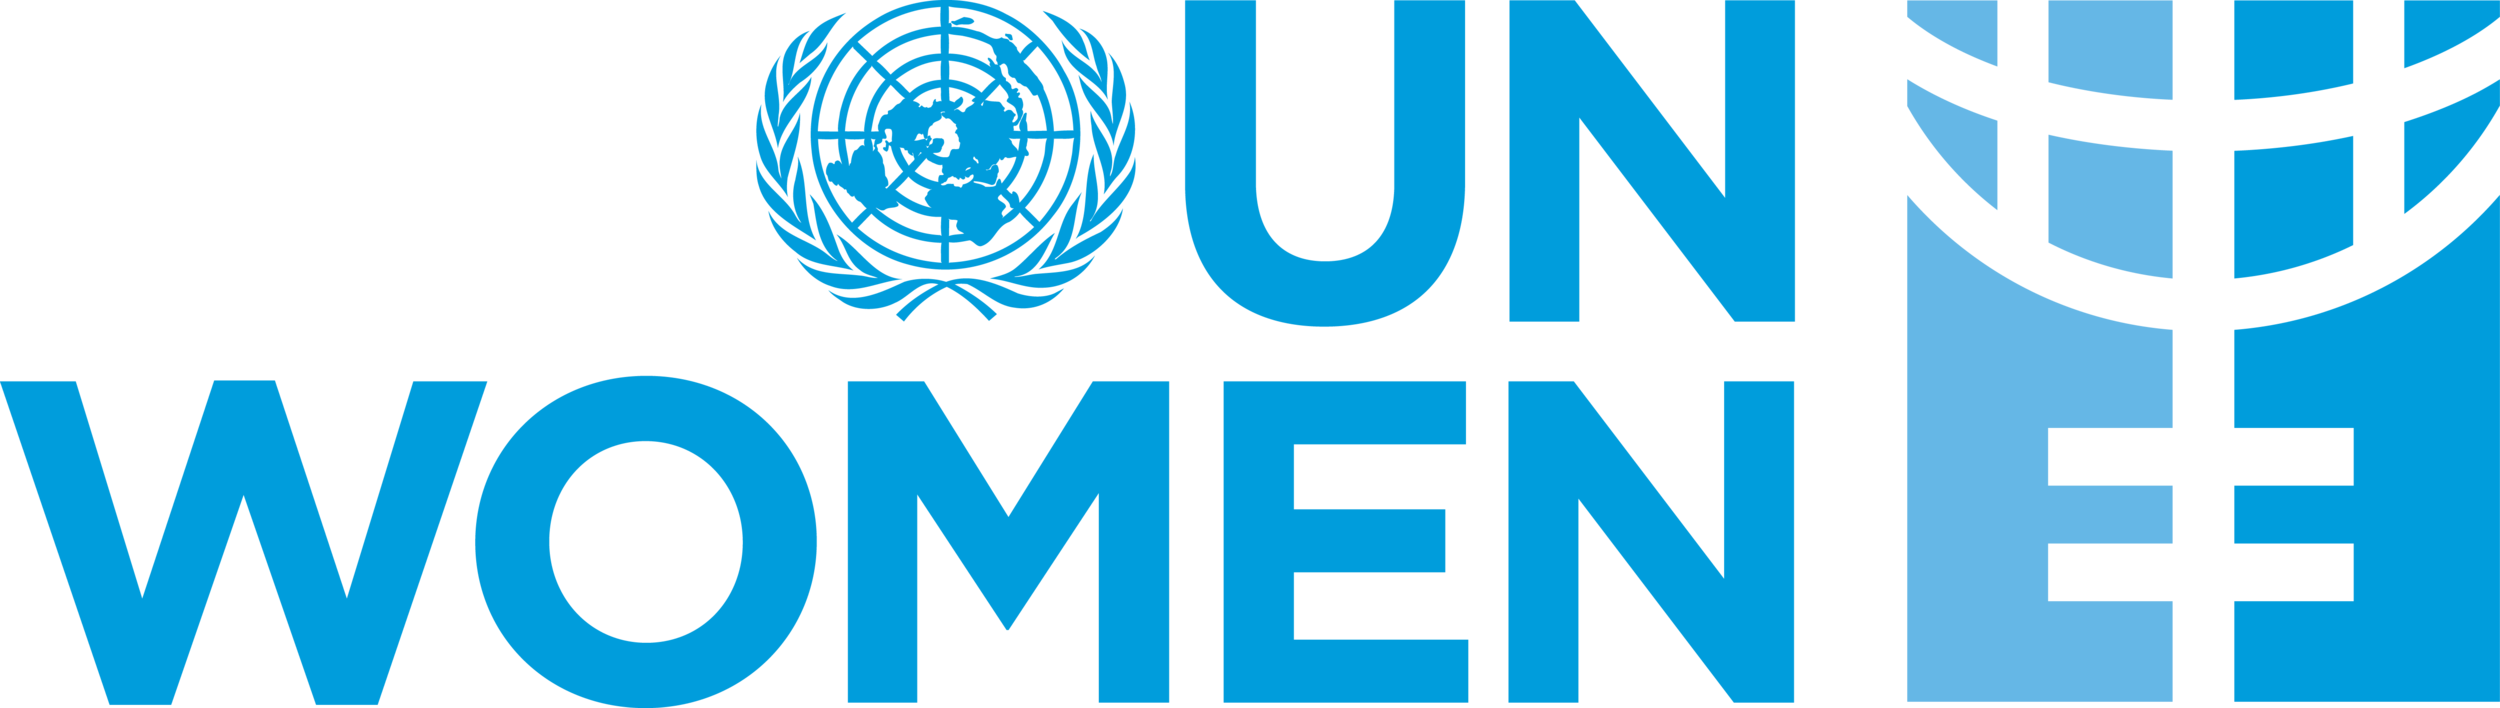 UN_Women_English_No_Tag_Blue_CMYK (highres).png